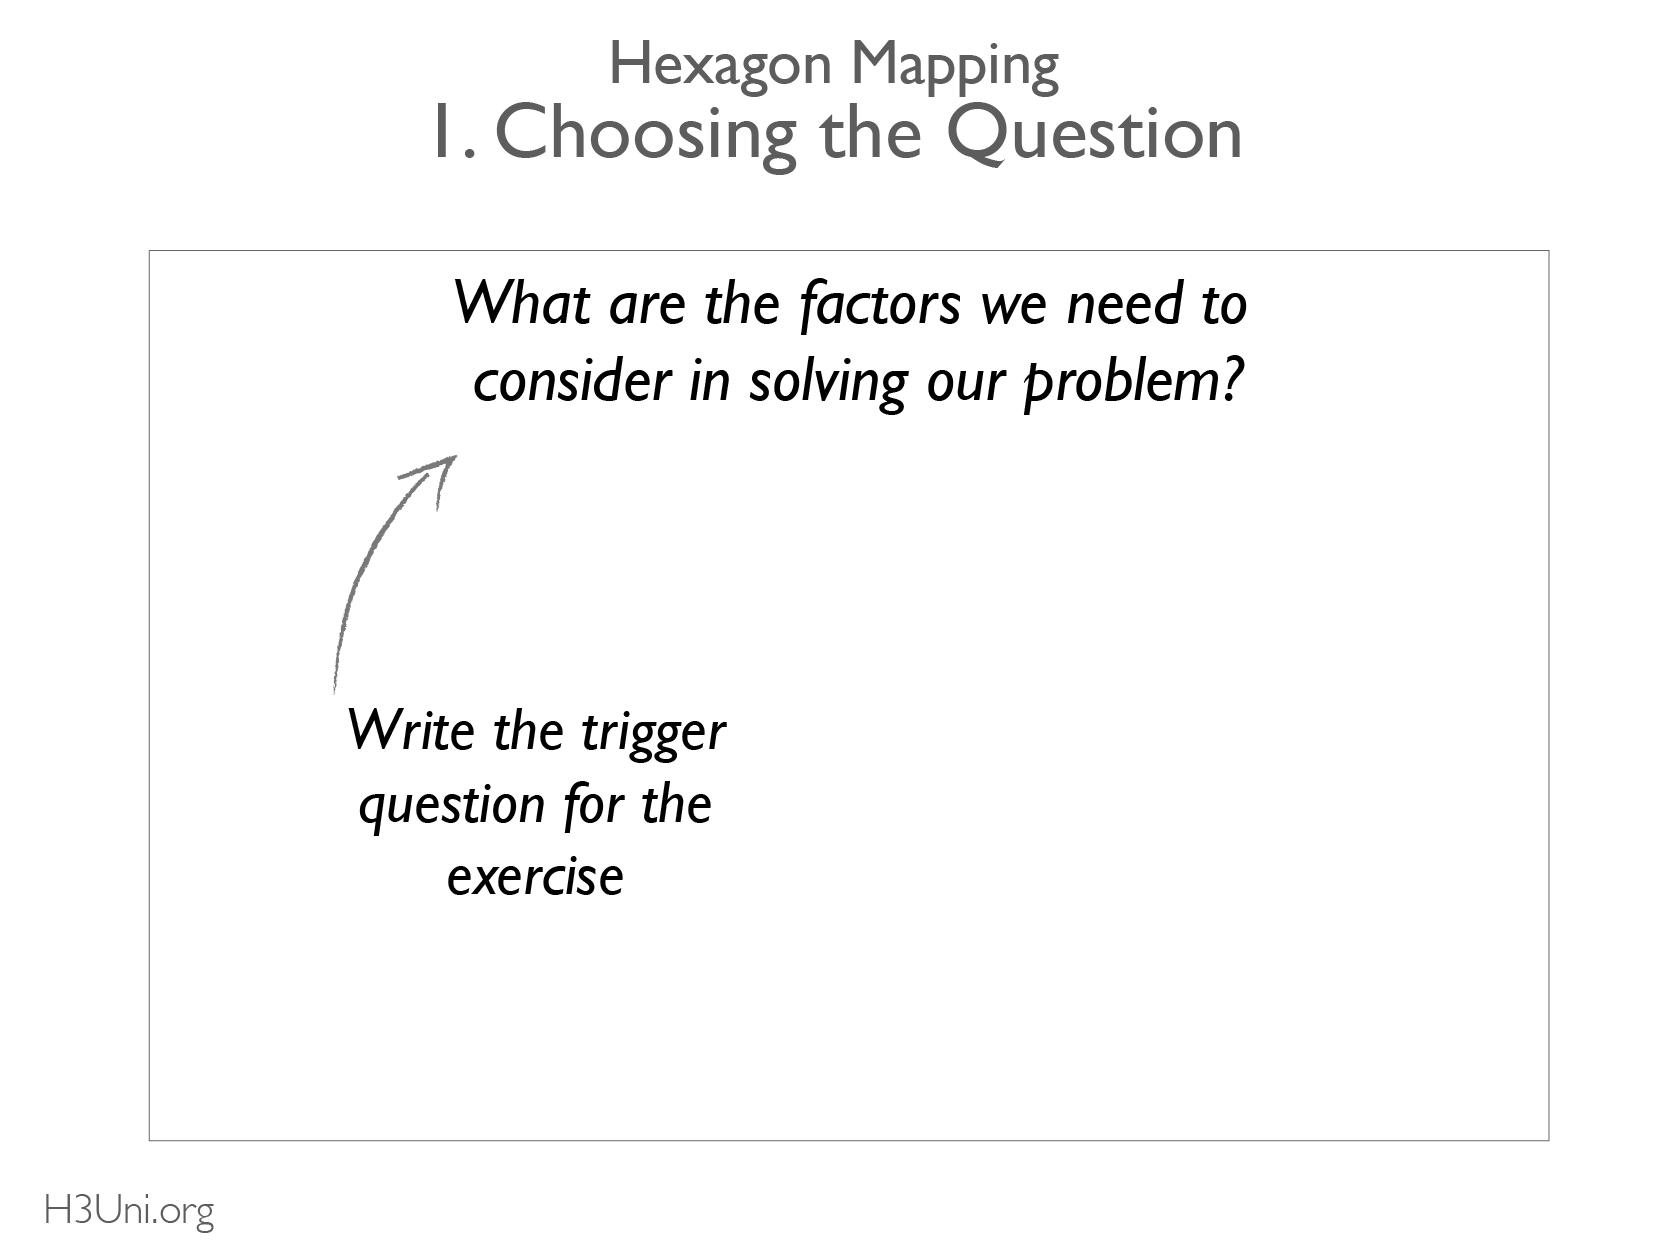 Hexagon - 1. Choosing hte Question